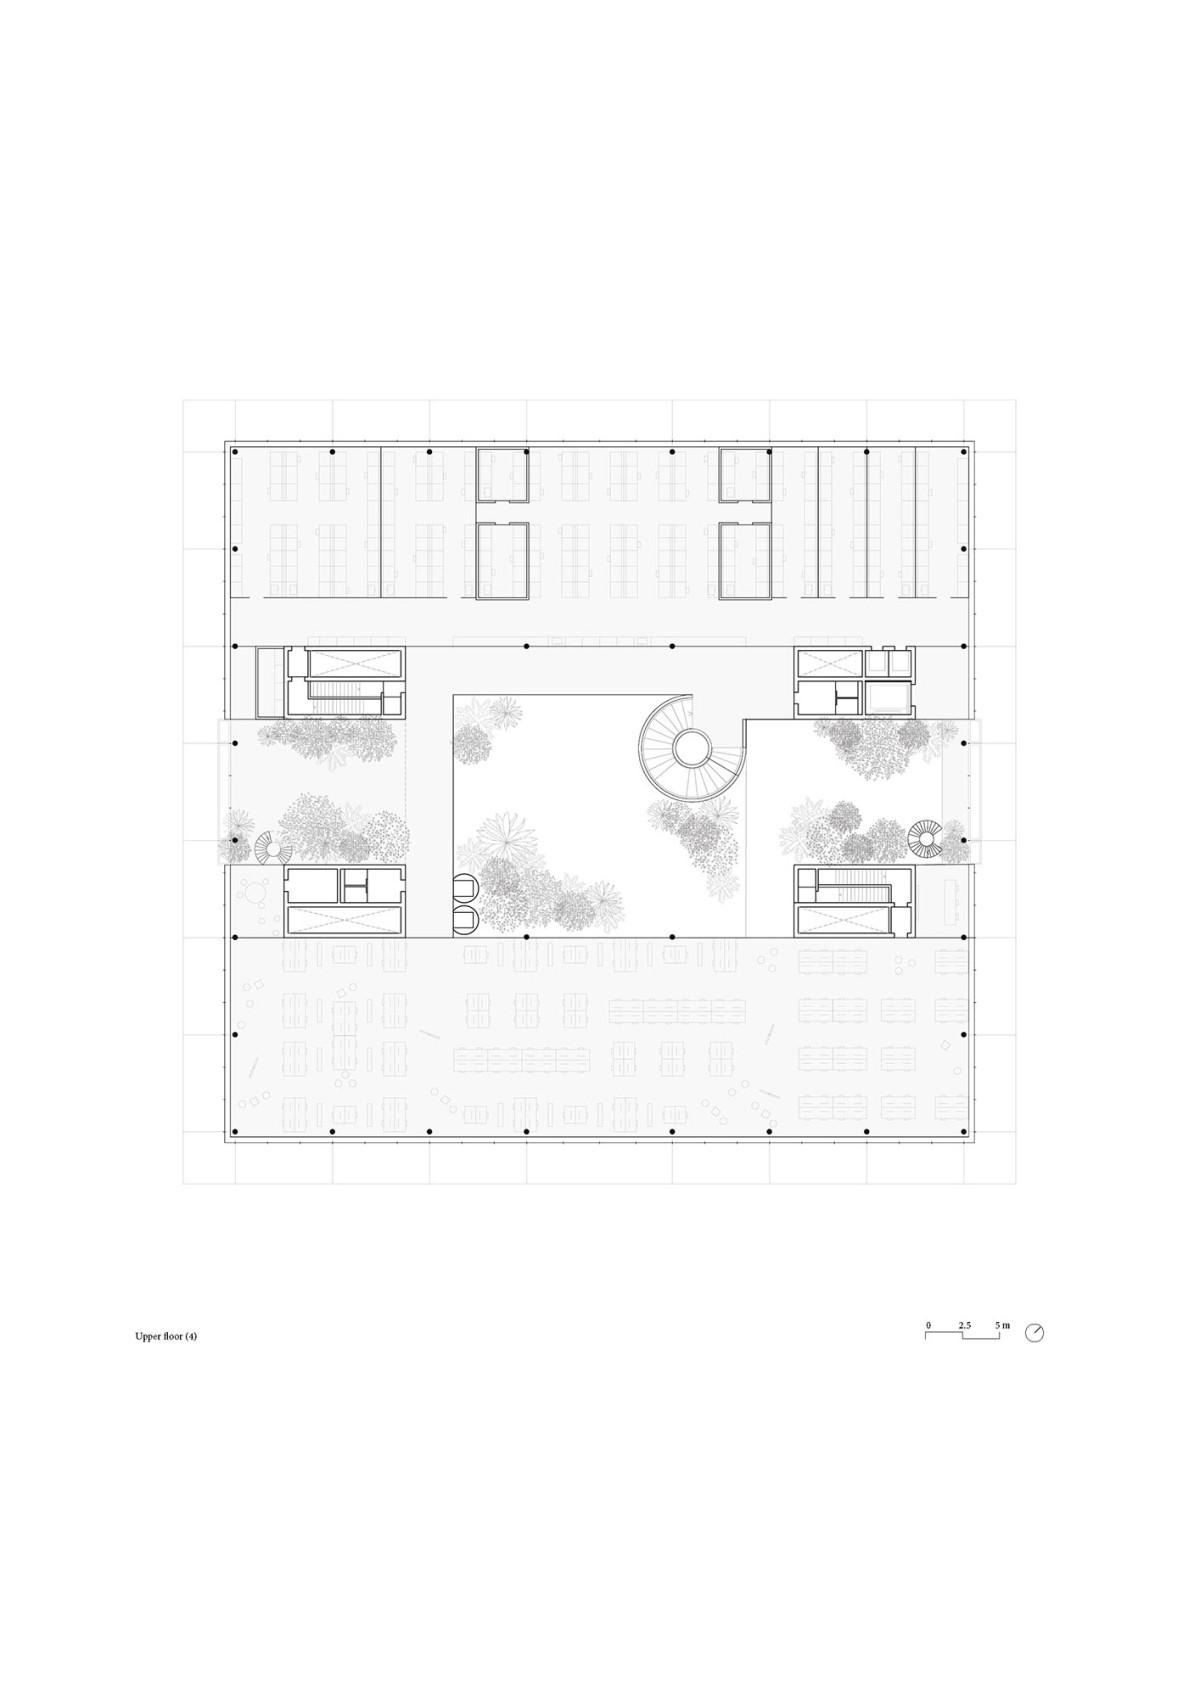 Barozzi Veiga . new BIST building . Barcelona afasia (12)